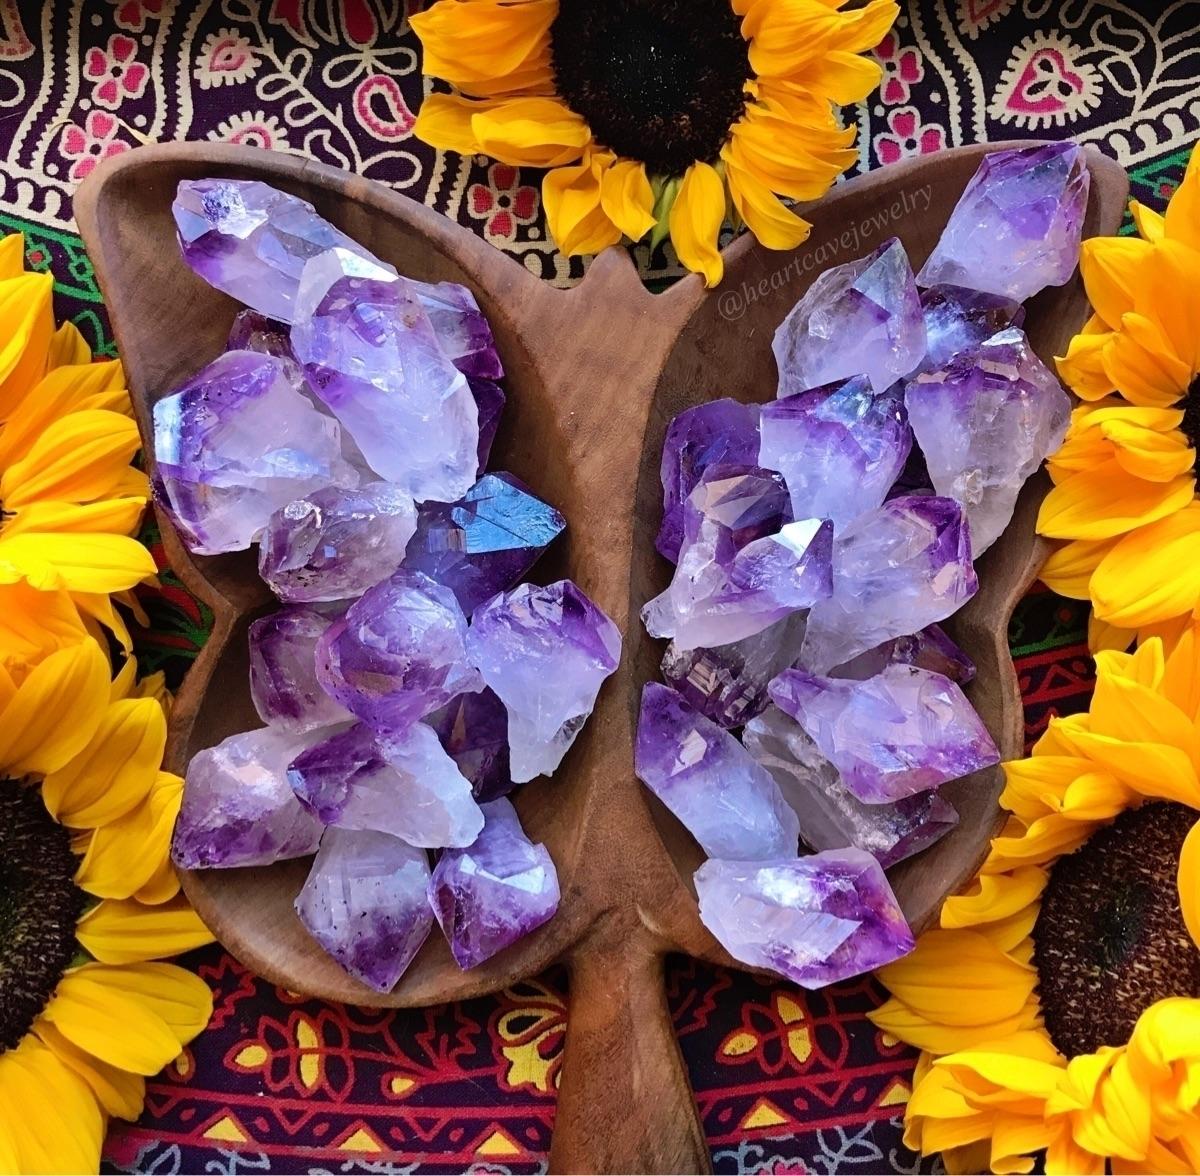 Hope beautiful day!:purple_hear - heartcavejewelry | ello